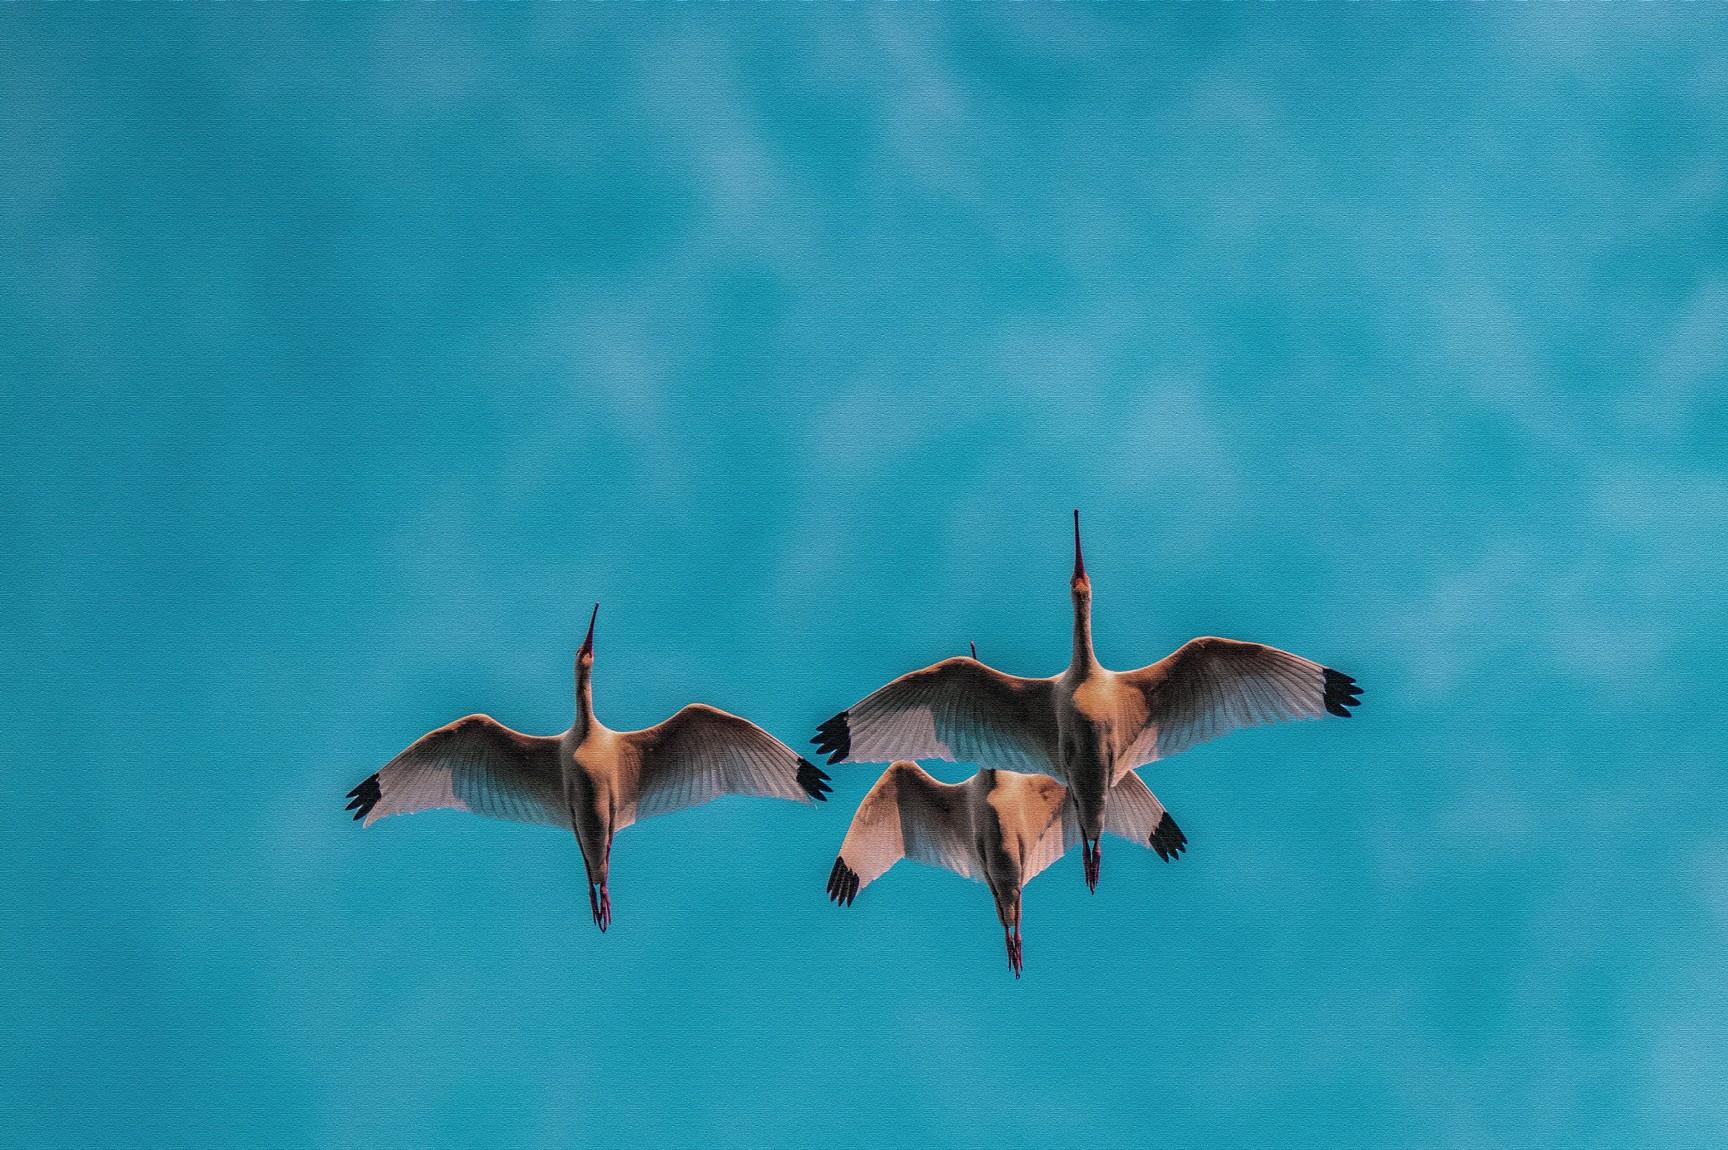 183-ibis-flying-(2)-f-rd.jpg